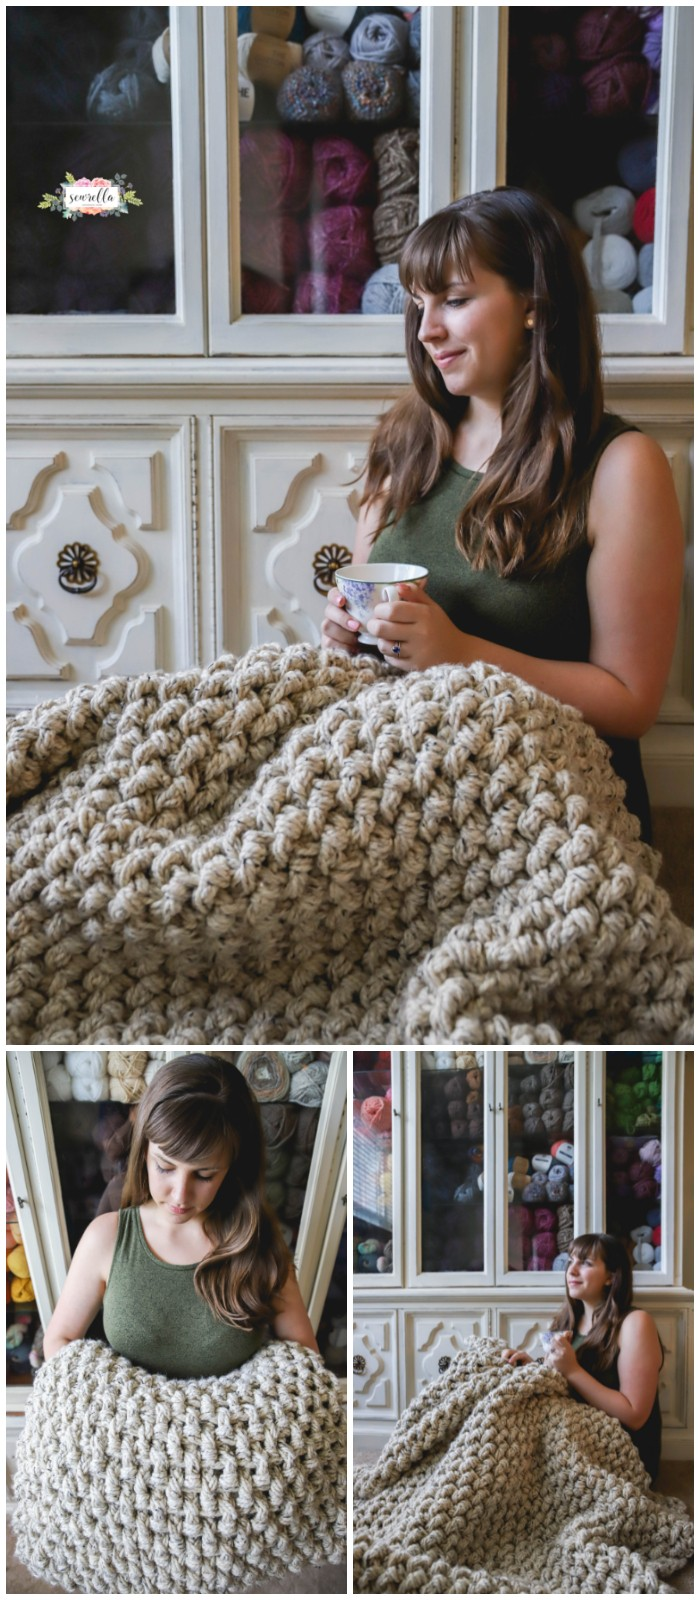 Crochet Mini Basketweave Blanket